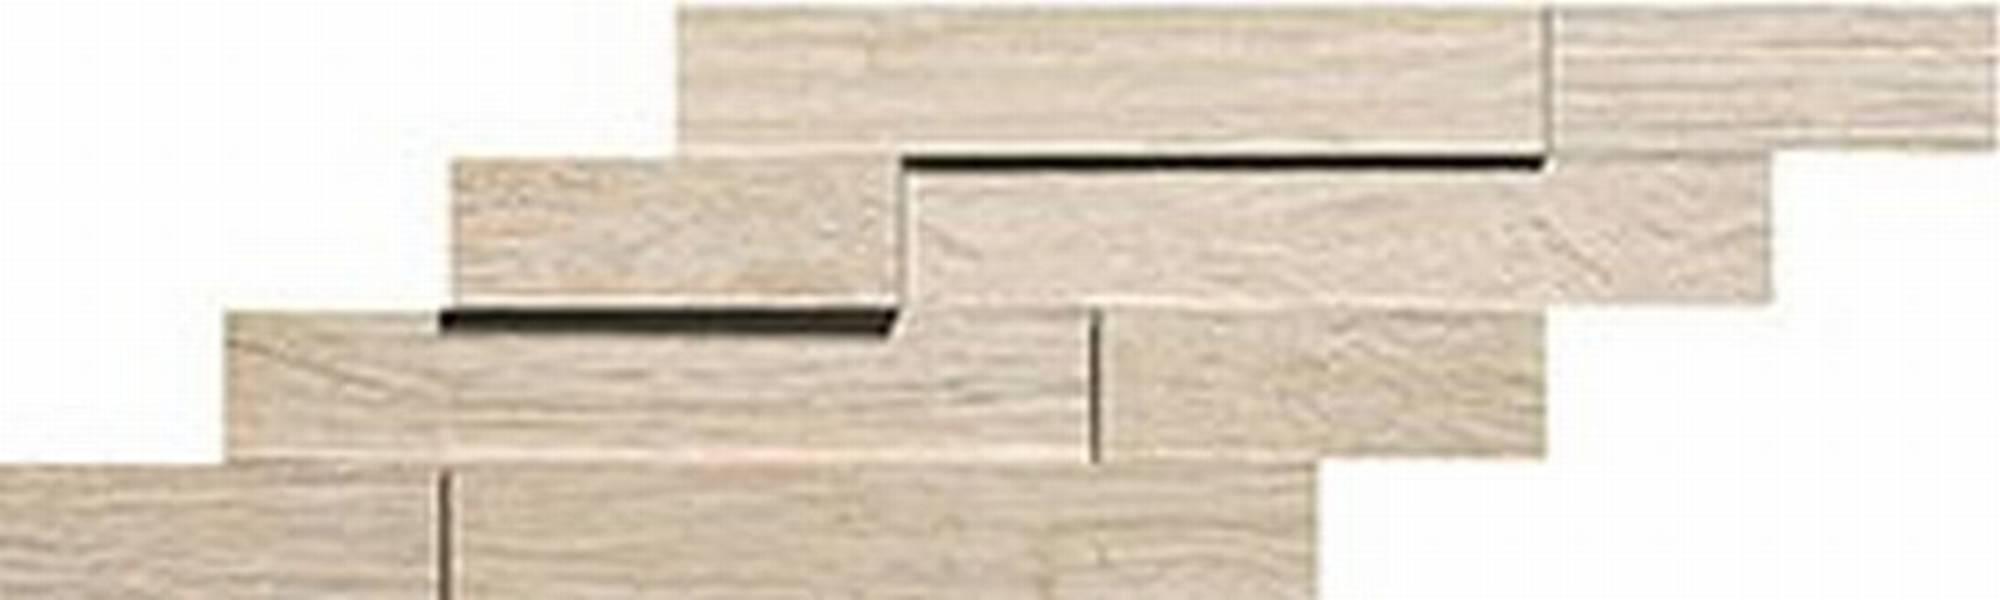 ATLAS CONCORDE AXI tegelmat brick 3d 20 x 44 cm. doos a 4 stuks WHITE PINE (AMWA)